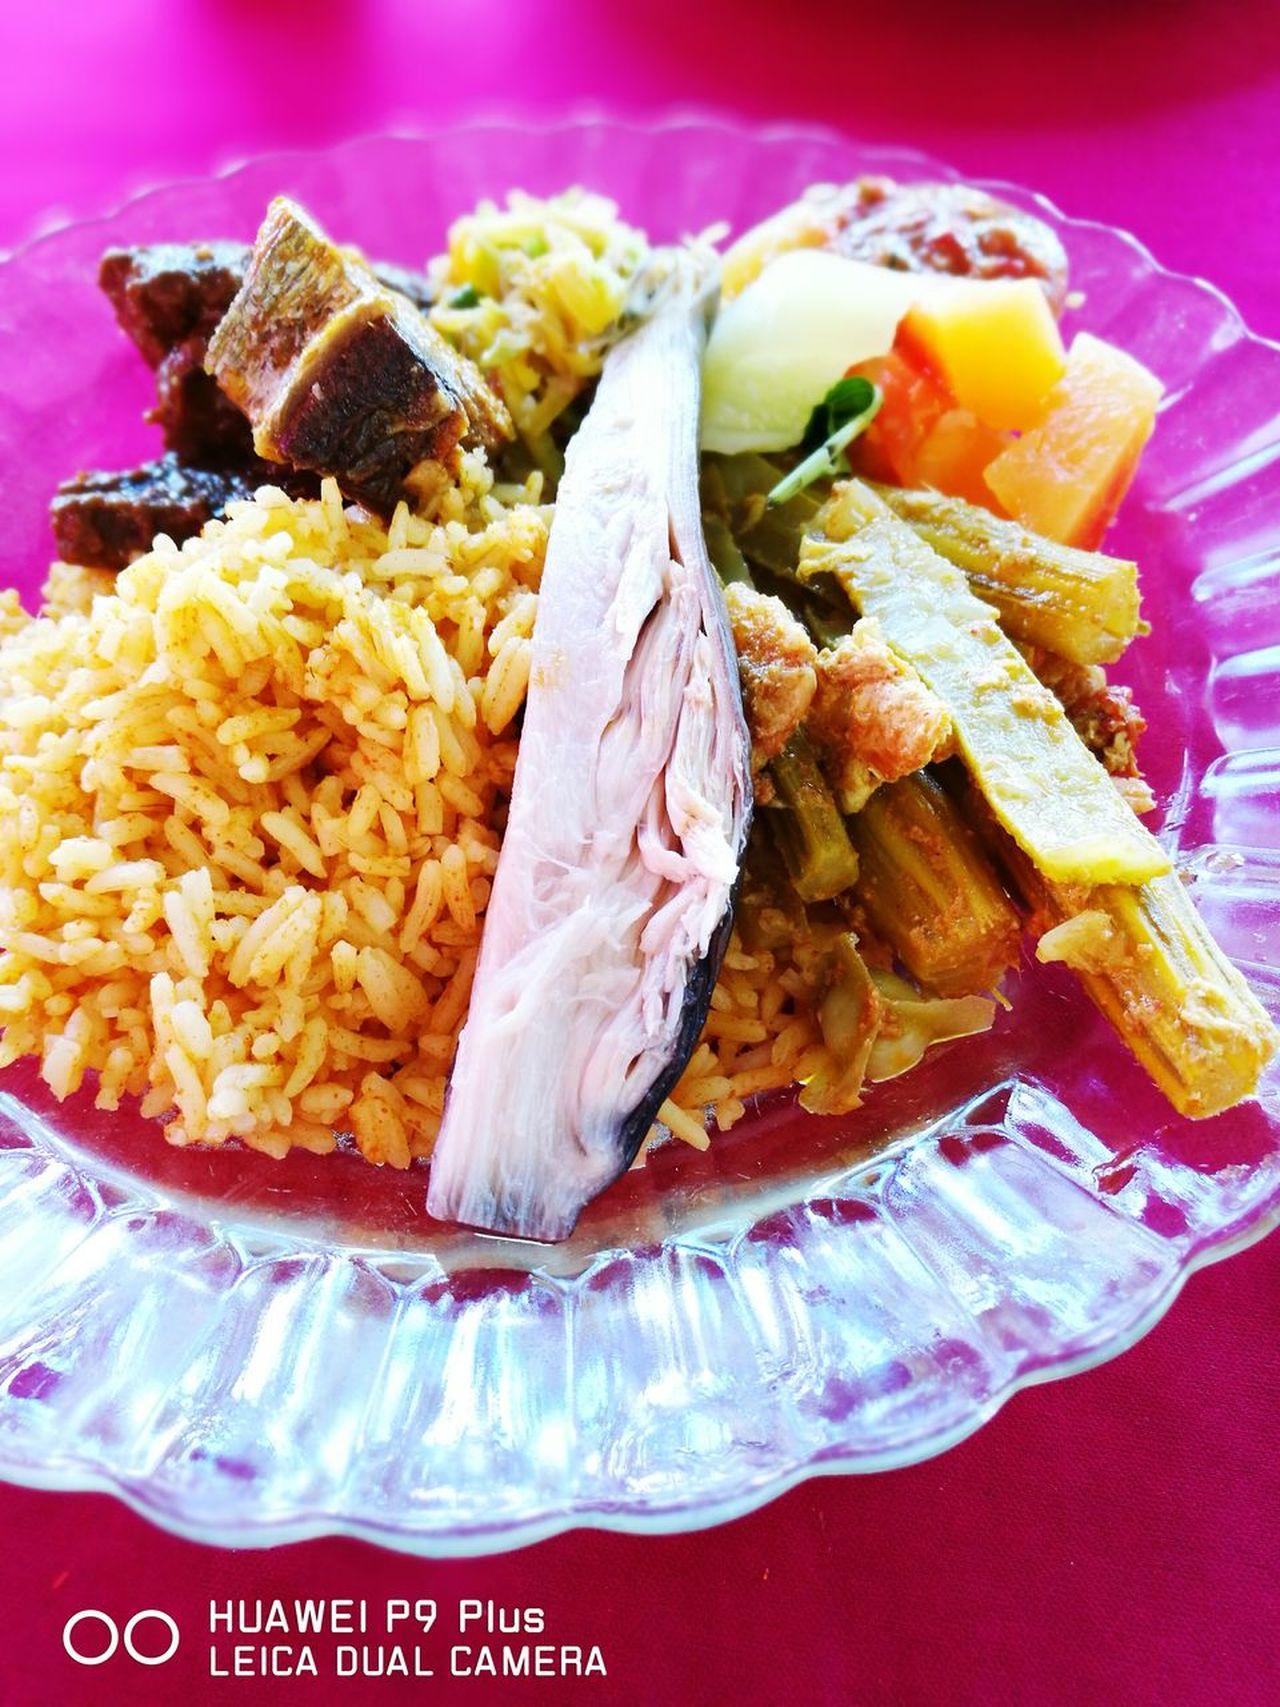 Kenduri kampubg style and we found rare foods eg merunggai and banana flower. Nusantara Food And Drink No People Food Kenduri Kahwin Ulam